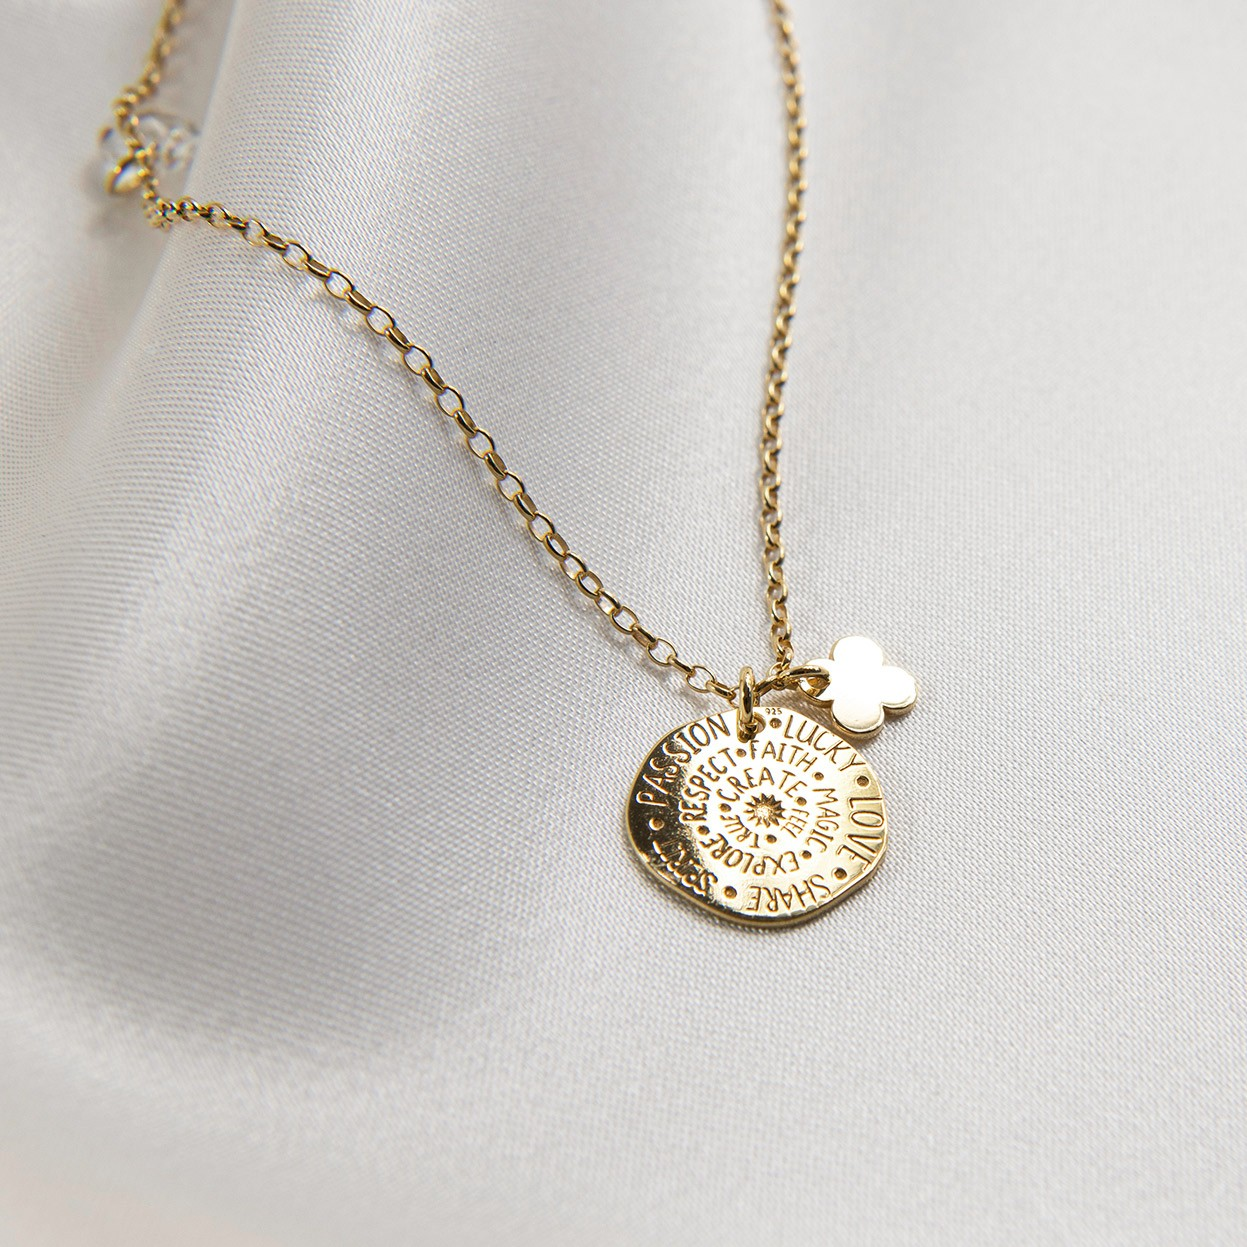 Silver star necklace with sun pendant, Swarovski crytal, MON DÉFI, silver 925